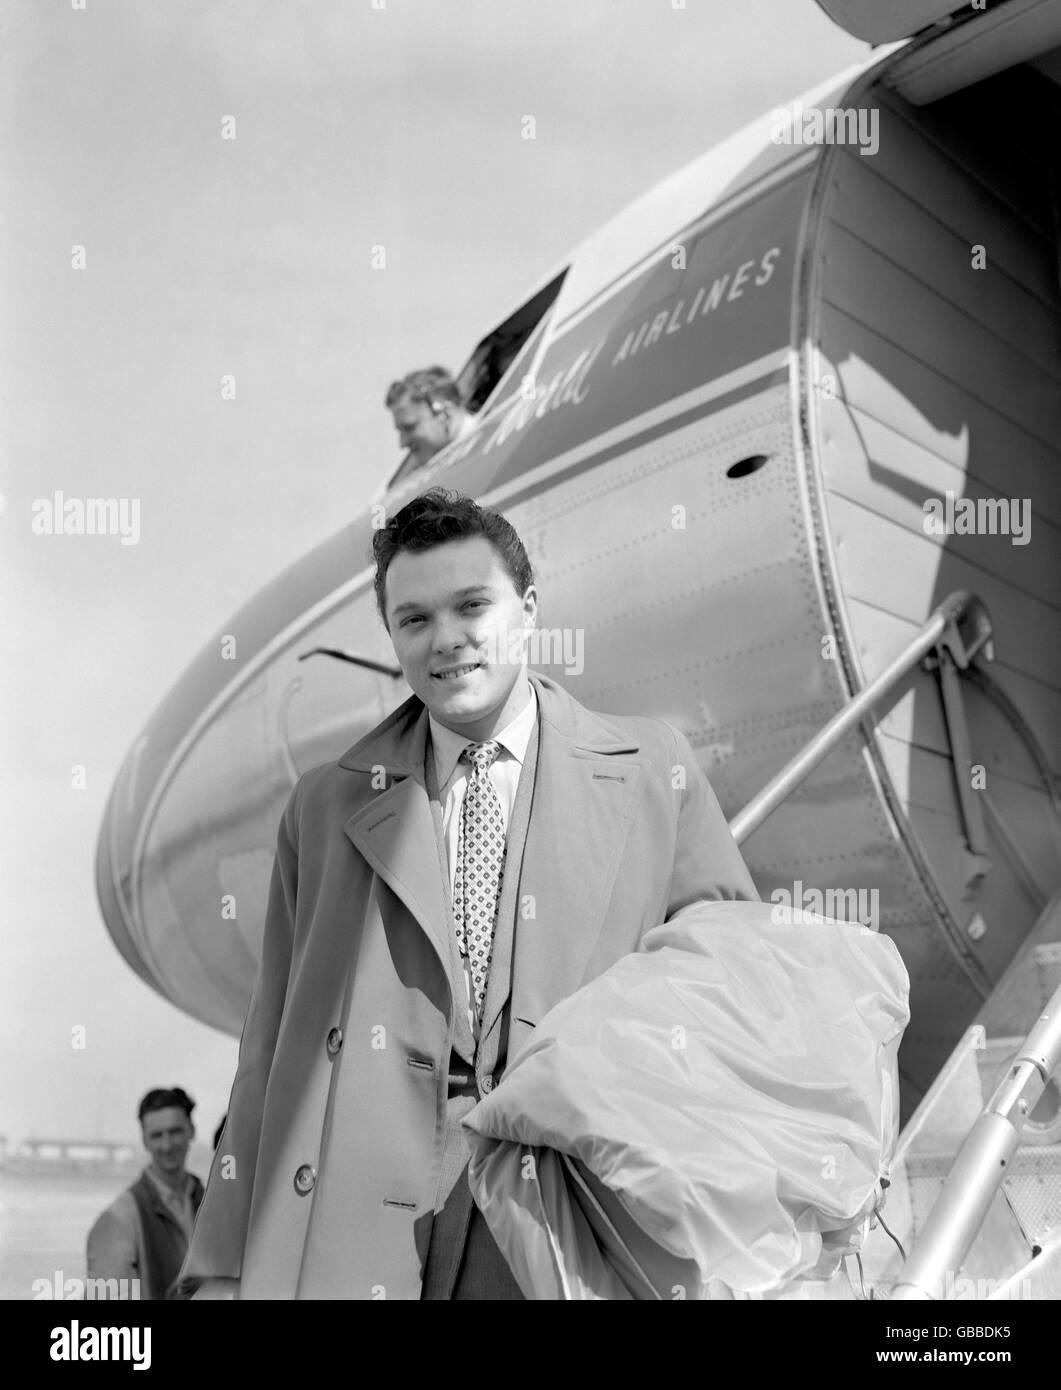 Music - Dickie Valentine - 1957 Stock Photo